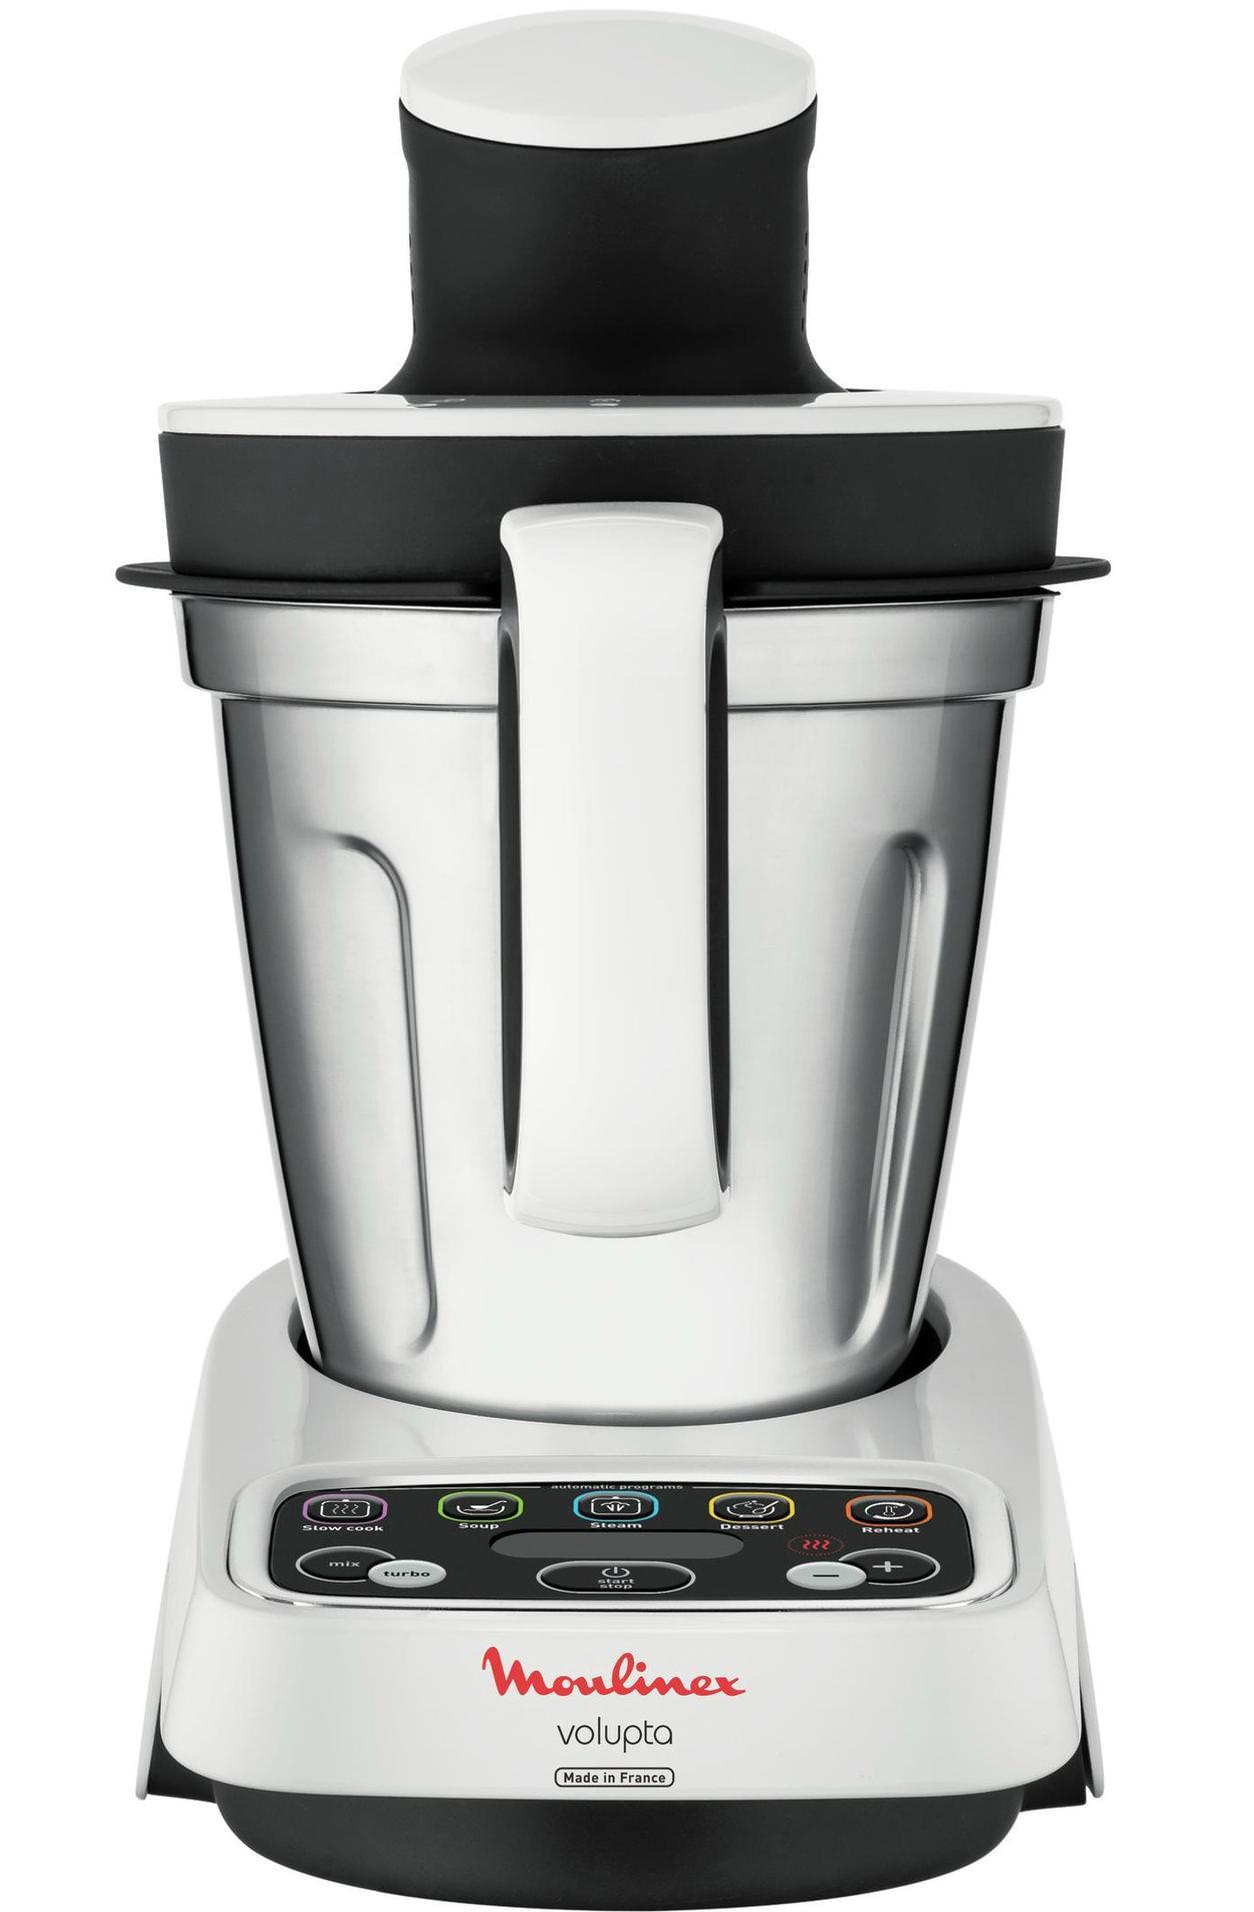 Robot cuiseur Moulinex Volupta HF404110 - 1000W